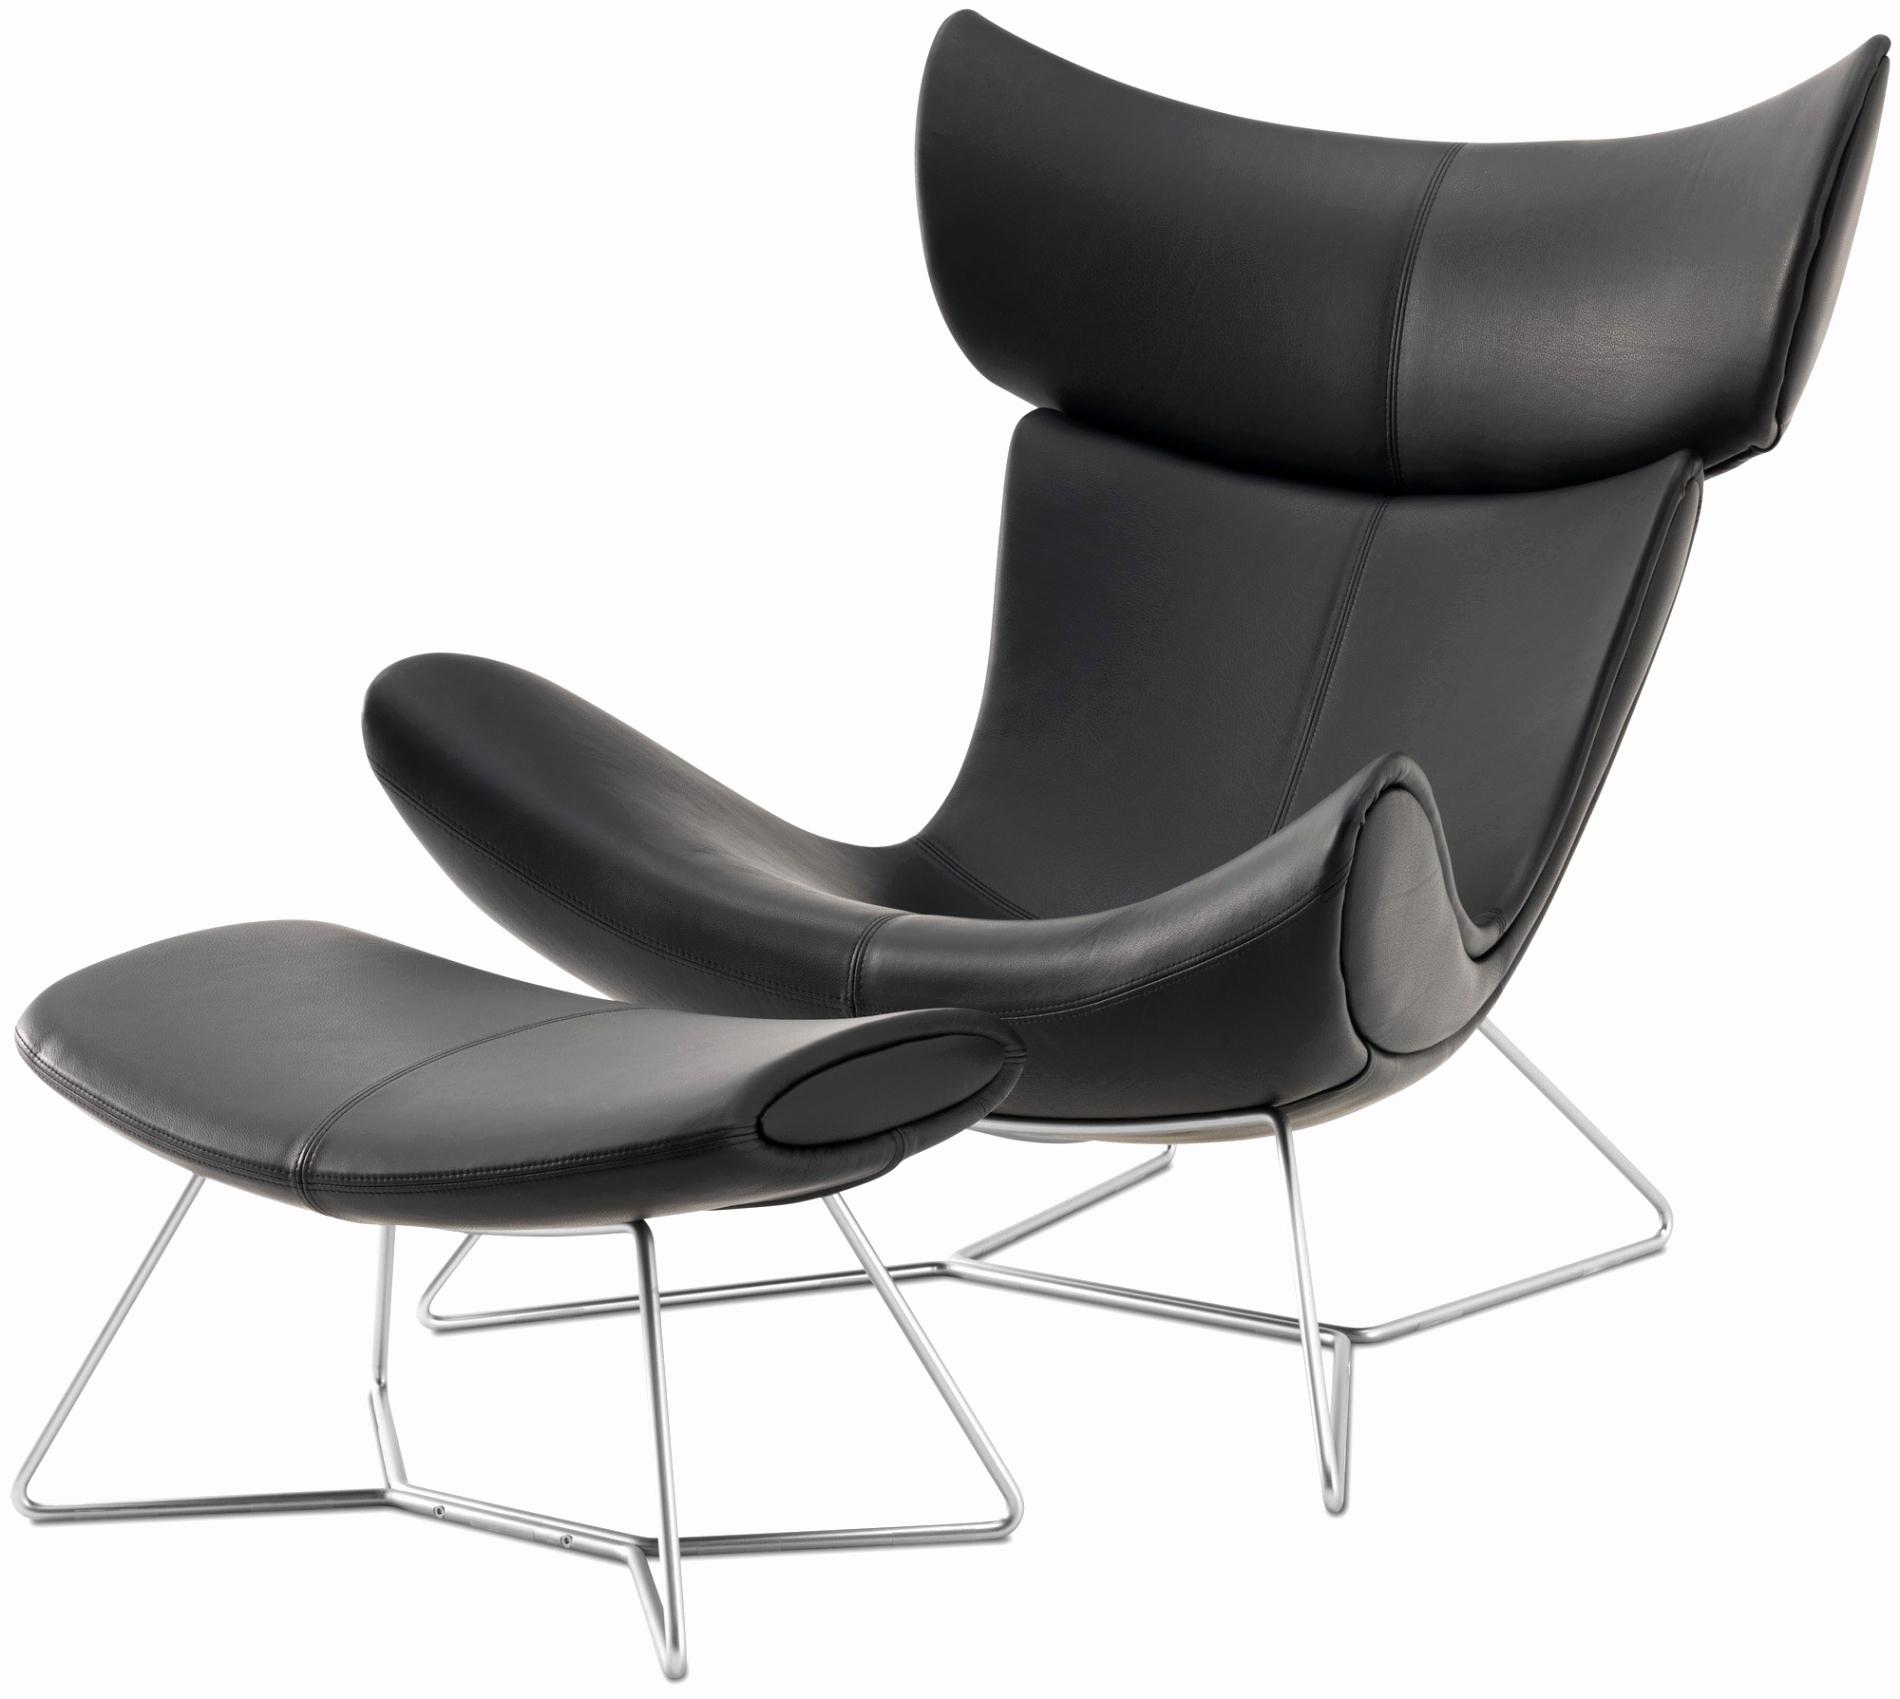 chaise ikea blanche beau chaise ikea bureau chaise ikea cuisine cuisine fauteuil salon 0d of chaise ikea blanche